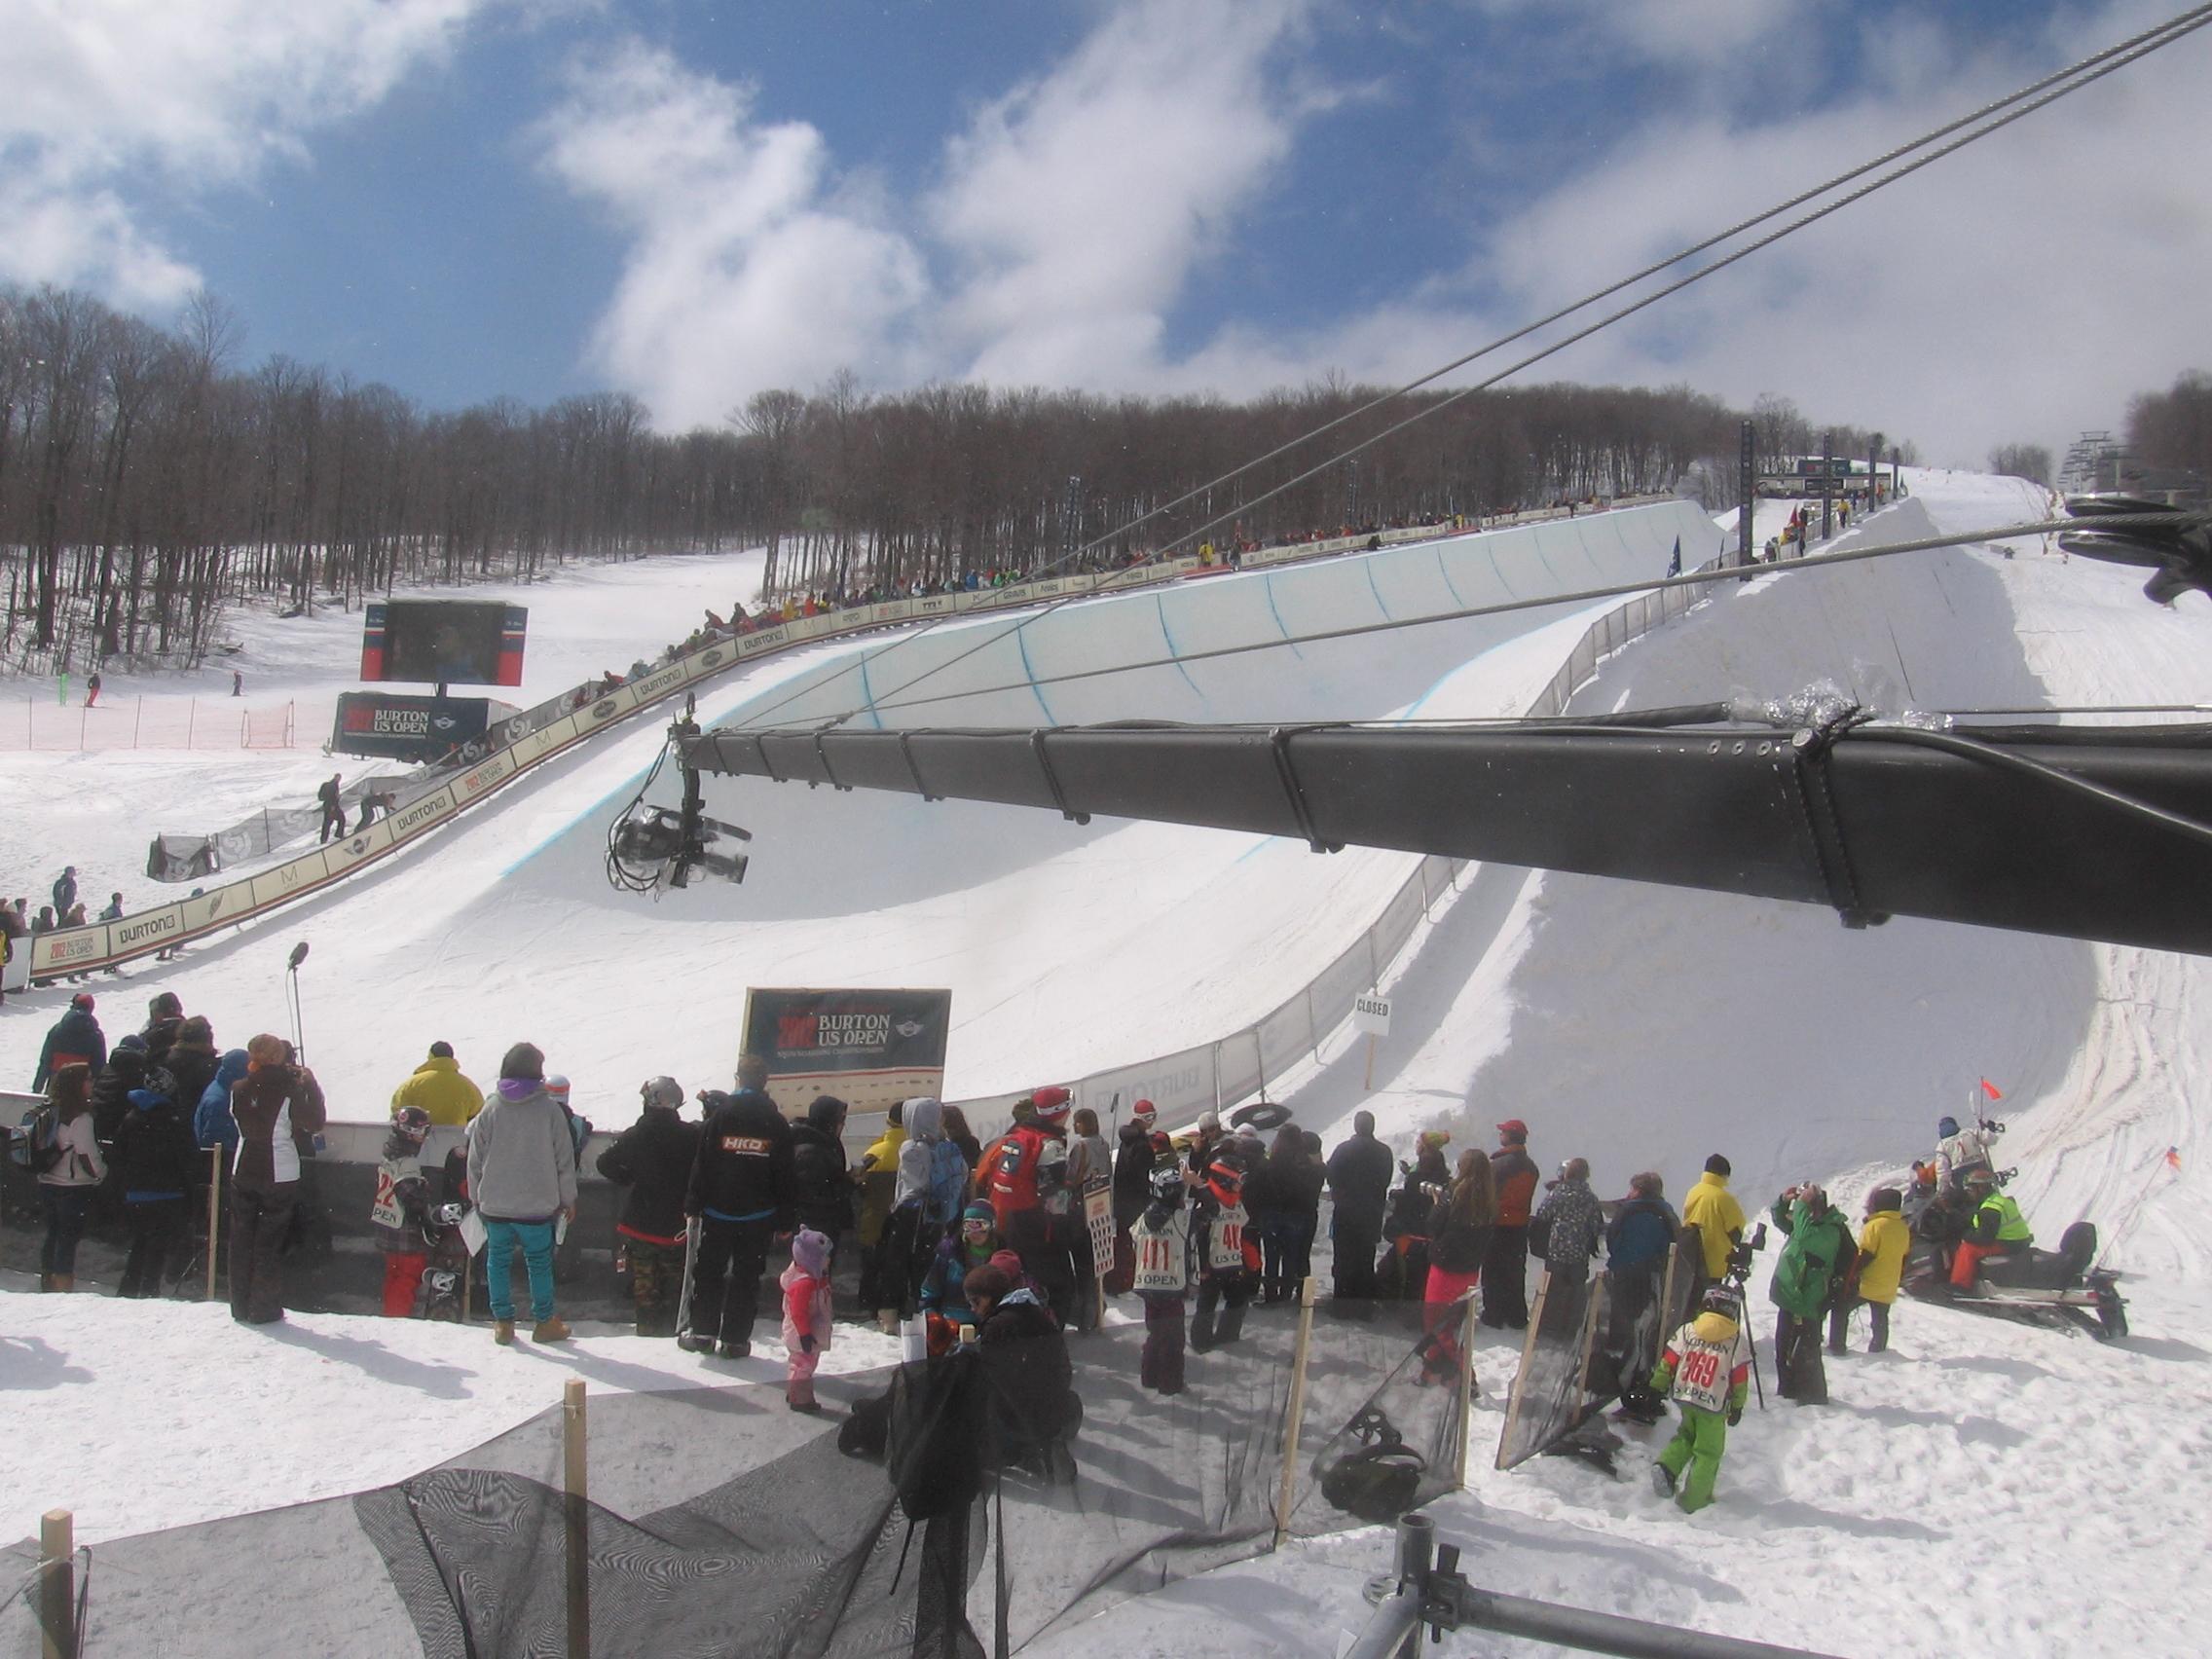 New York Jib, jimmy jib at Stratton Mountain for snowboarding championships